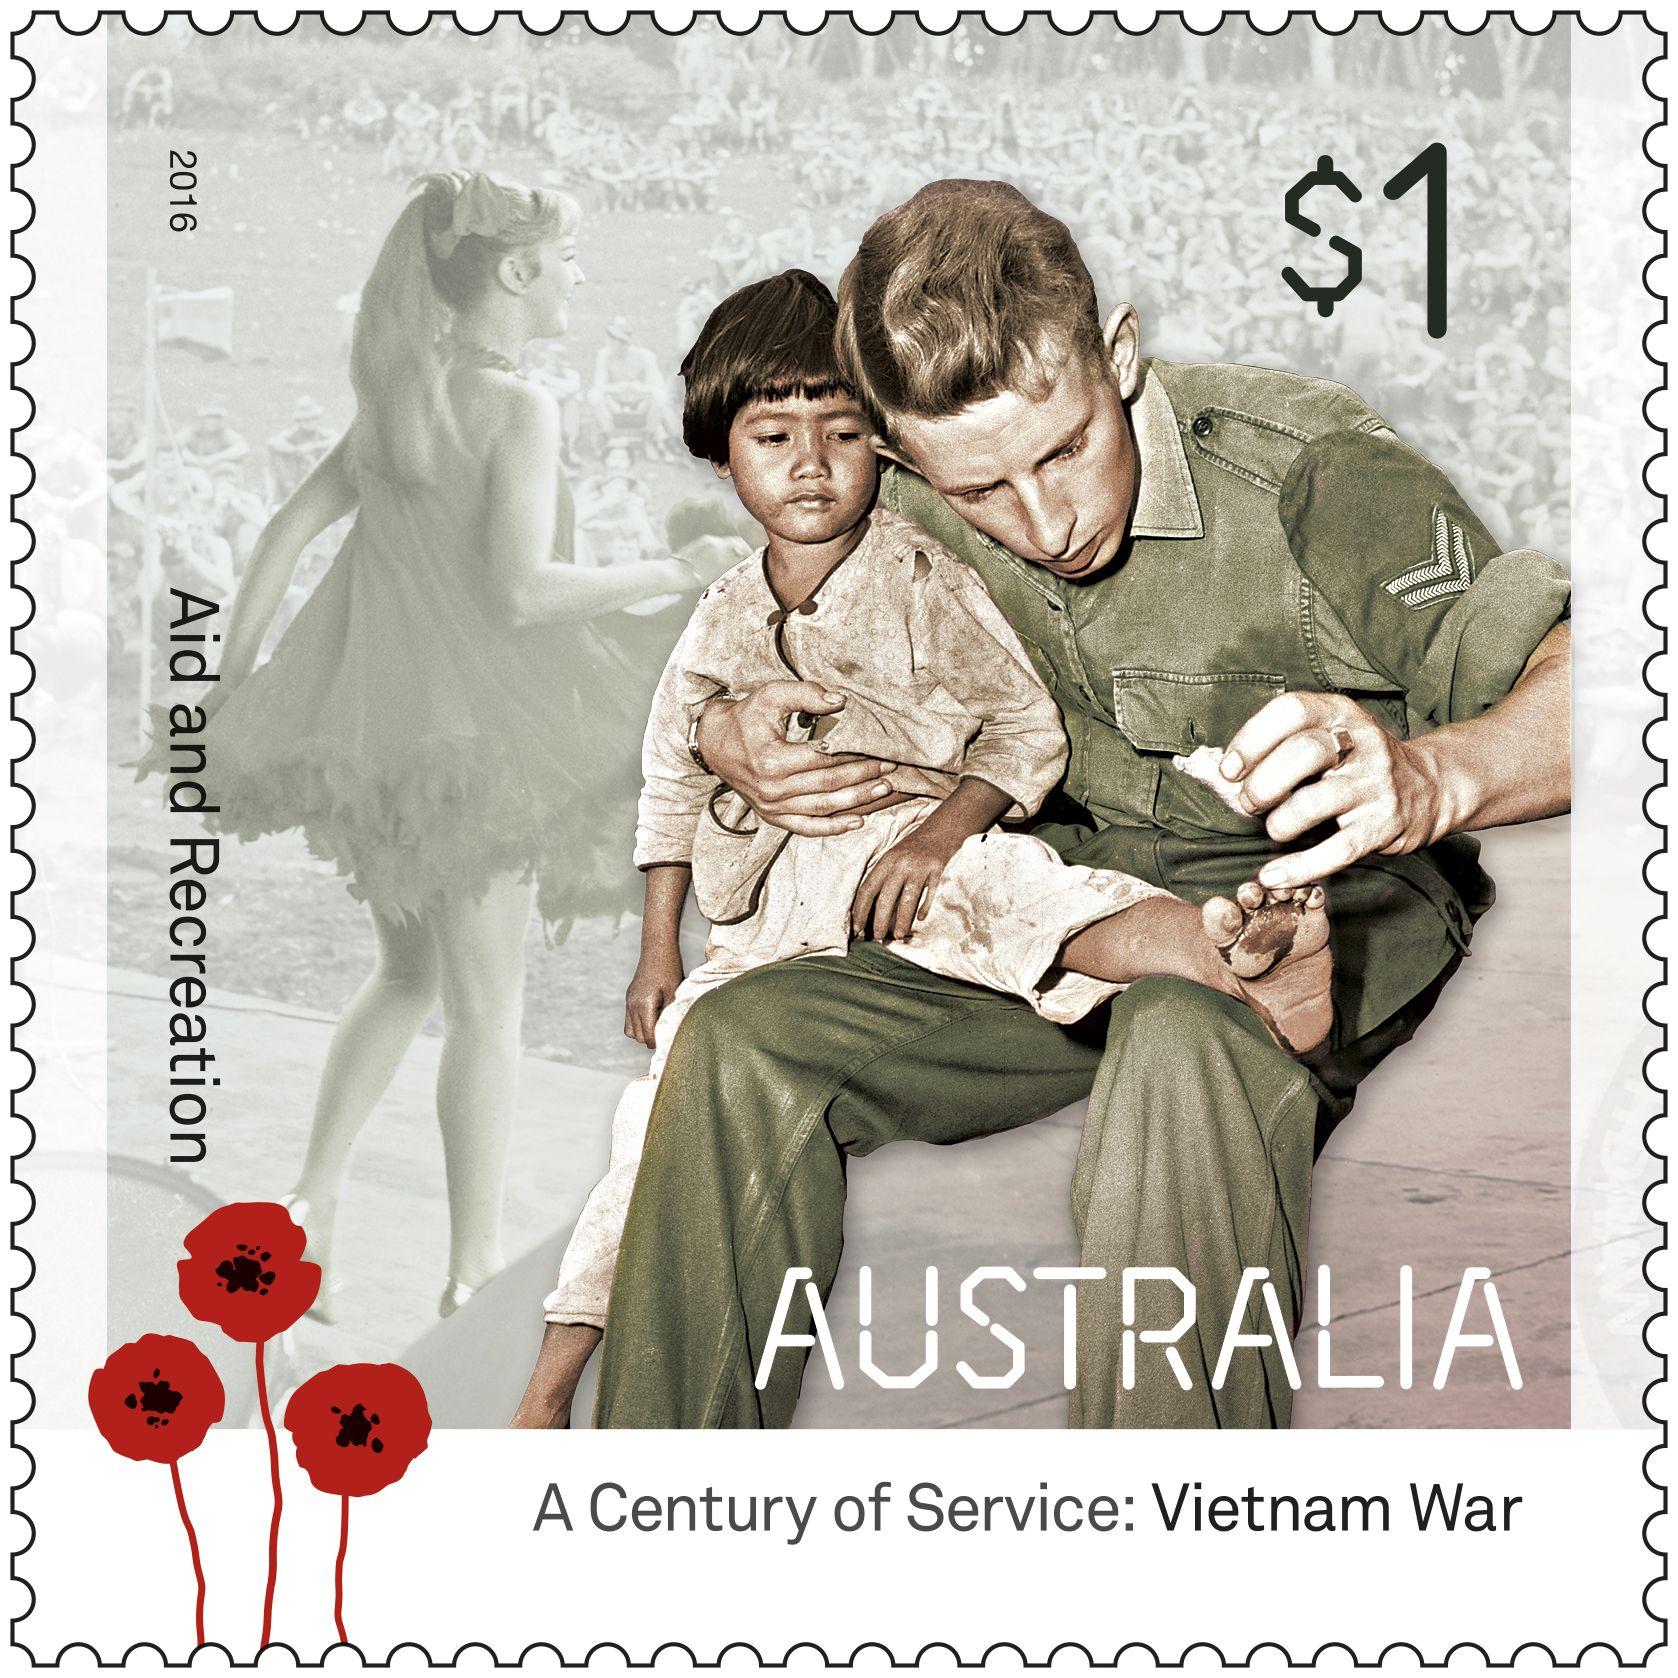 Military history of Australia during the Vietnam War